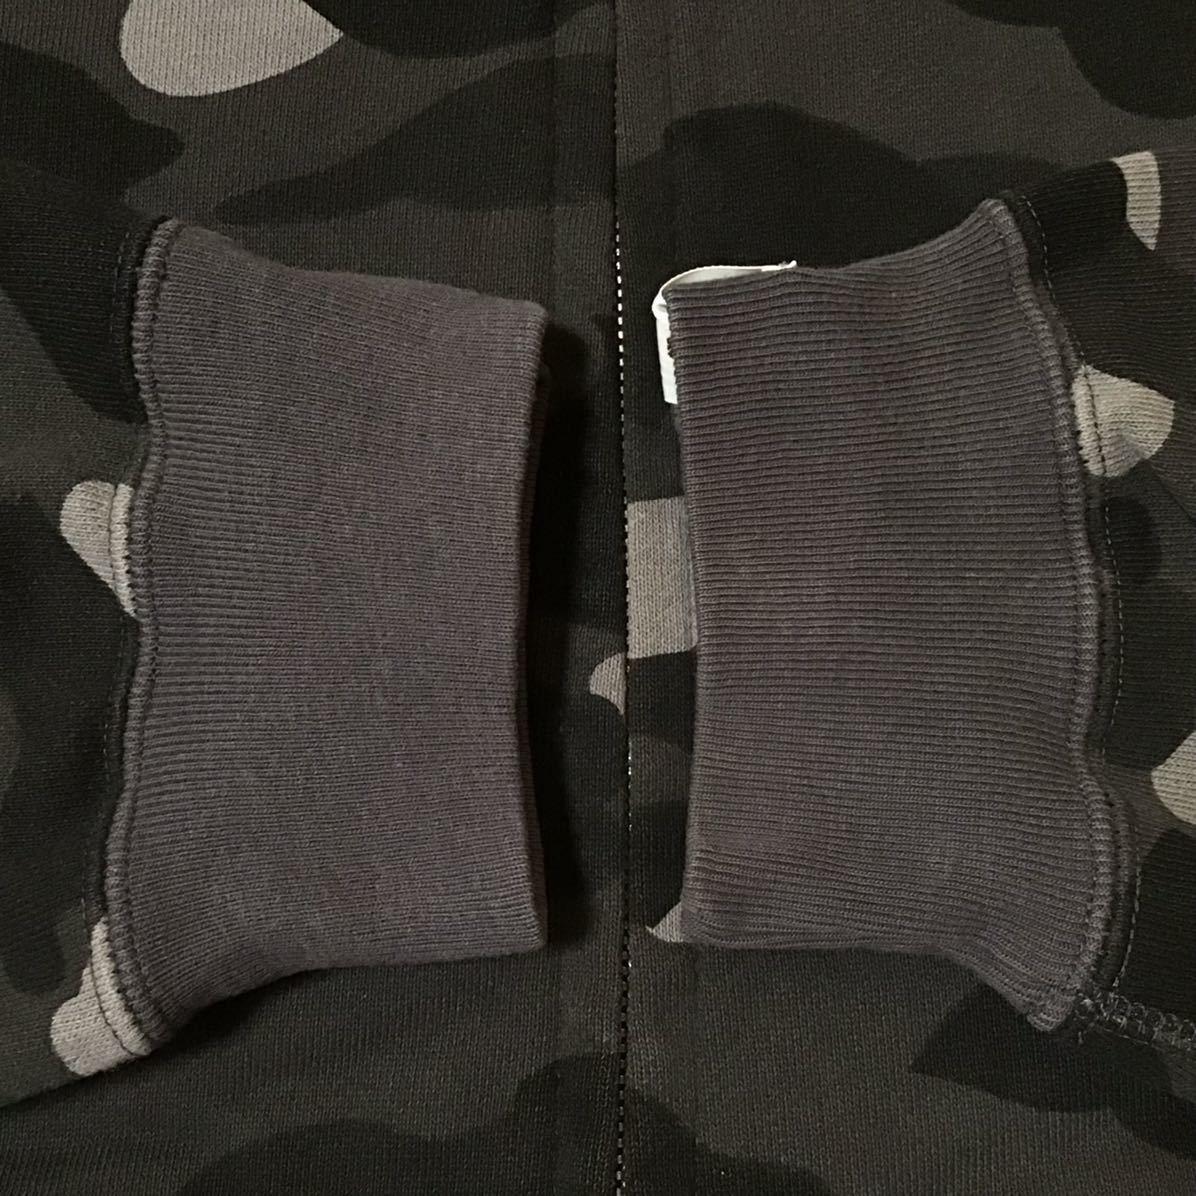 Swarovski パーカー Lサイズ black camo ラインストーン a bathing ape bape full zip hoodie スワロフスキー ベイプ エイプ 迷彩 8m8